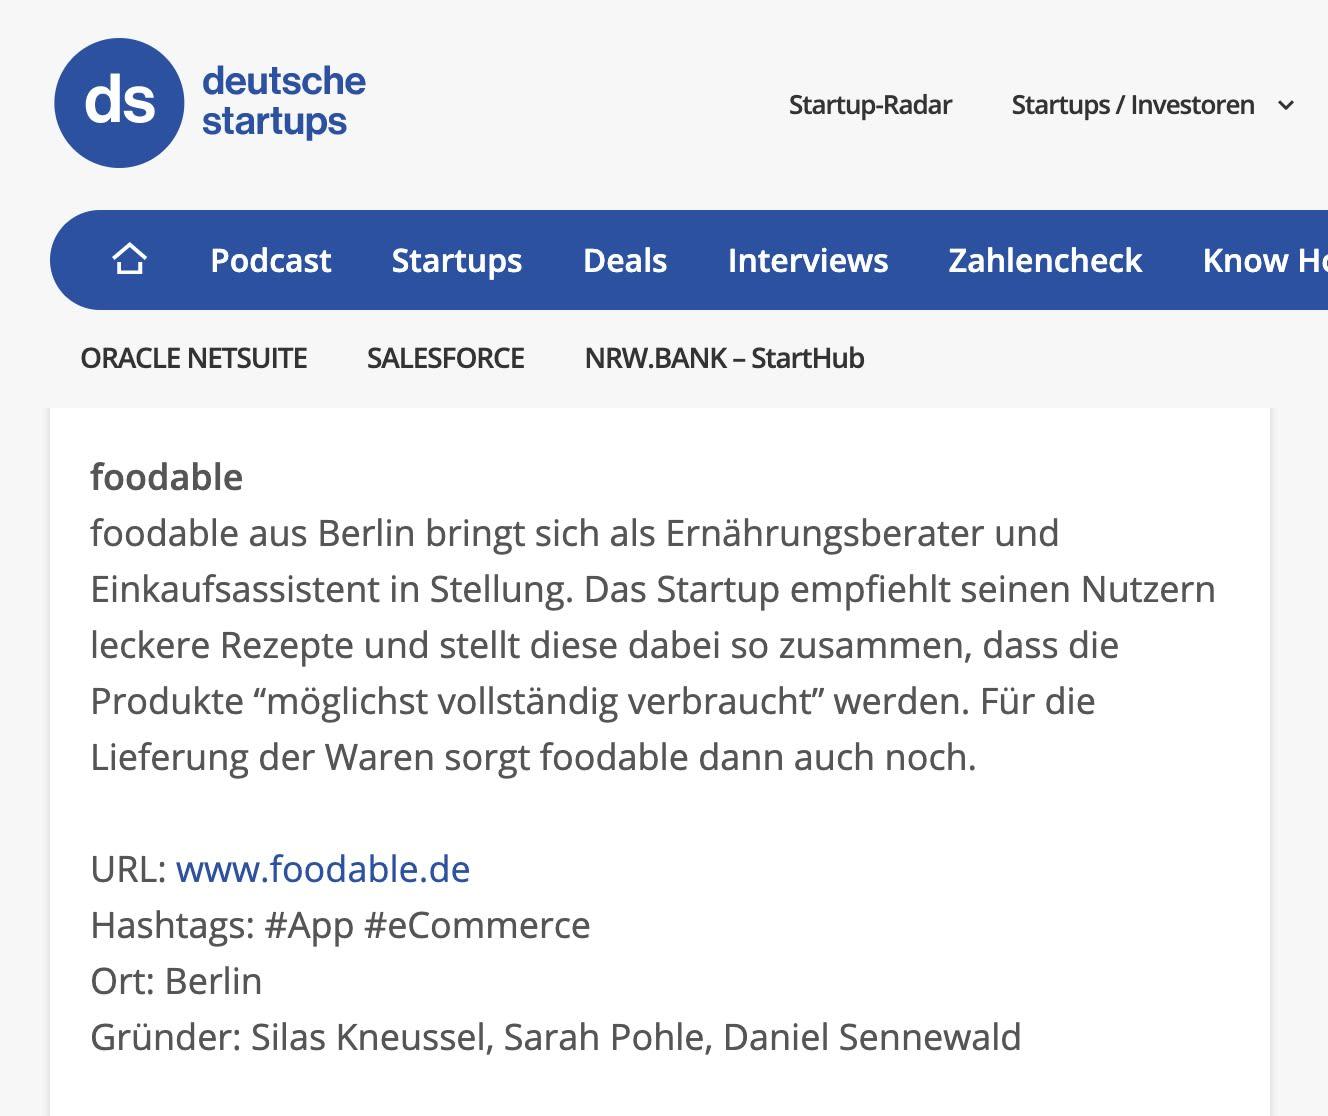 deutsche startups erwähnt foodable®